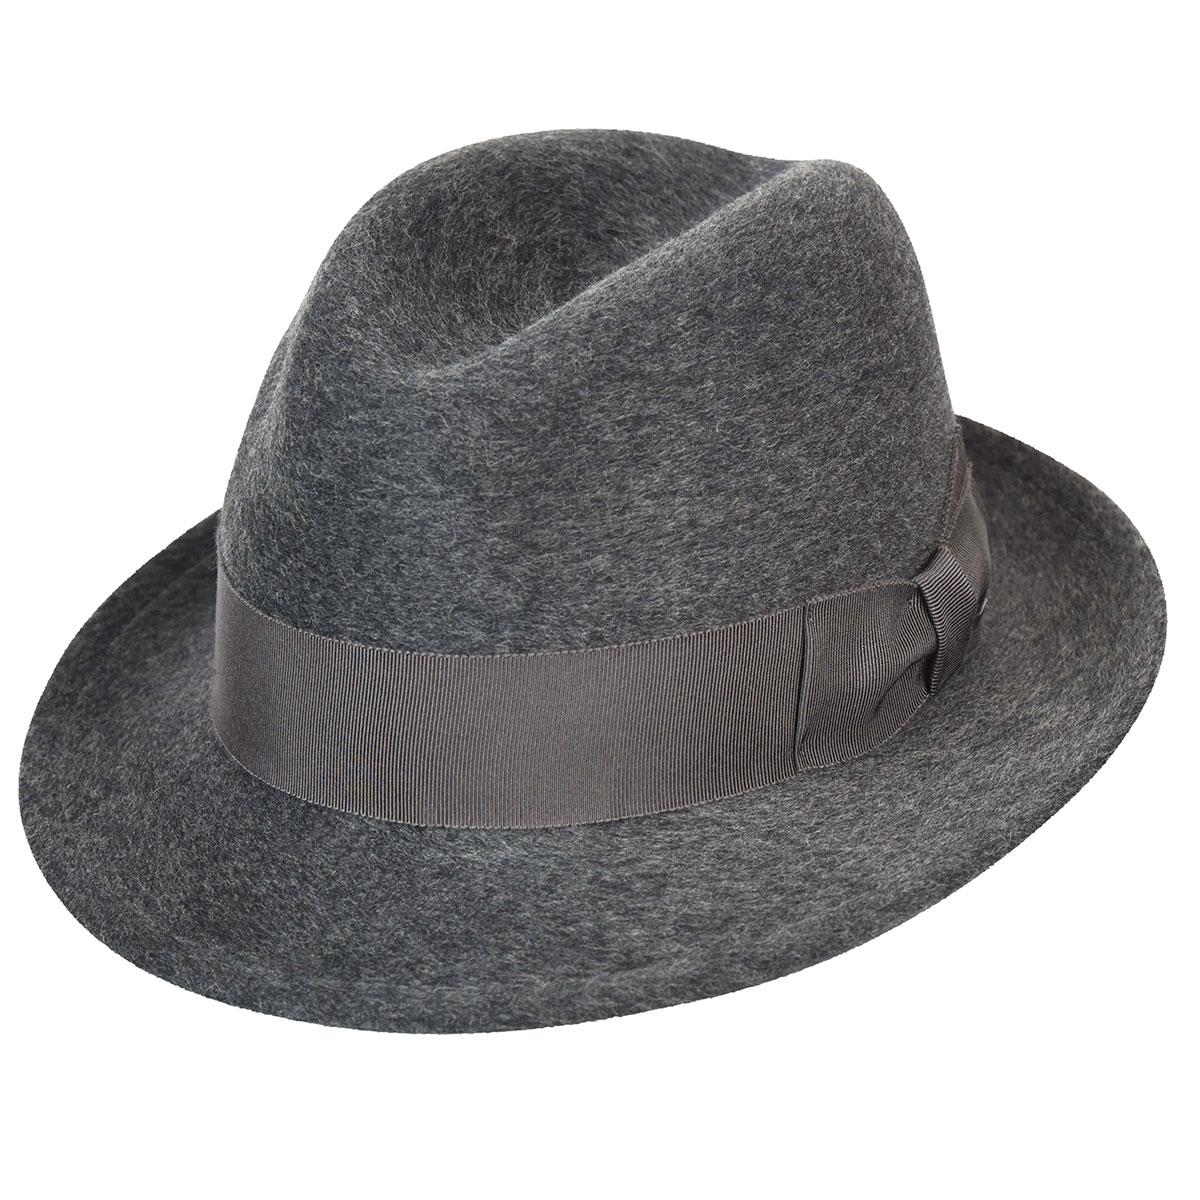 1920s Mens Hats & Caps | Gatsby, Peaky Blinders, Gangster Riff Fedora $93.75 AT vintagedancer.com